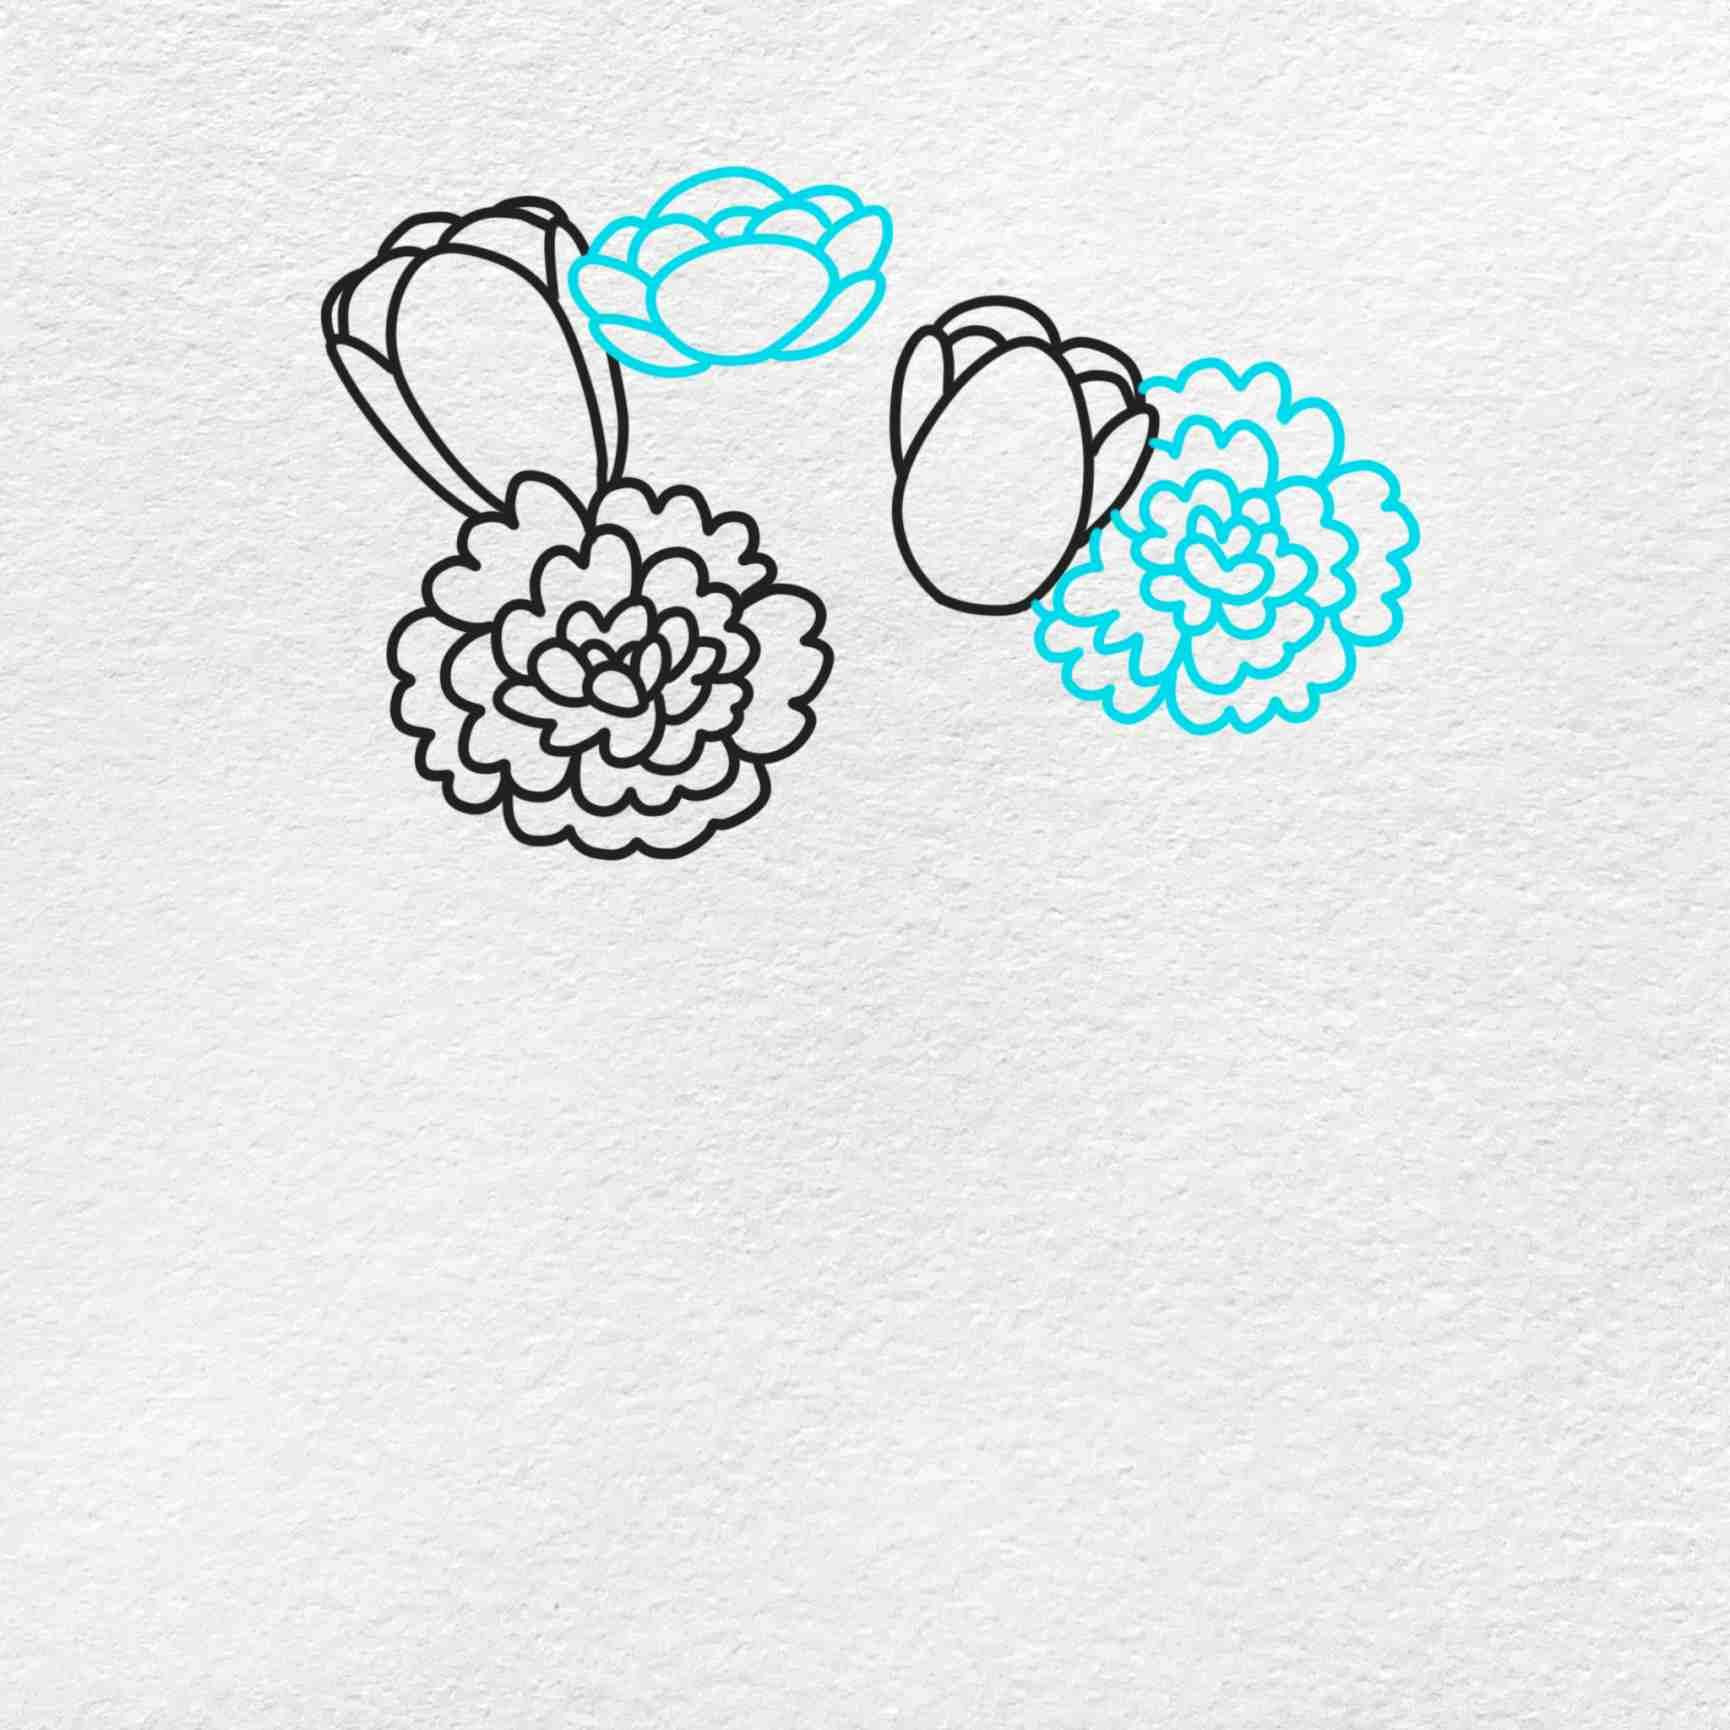 Spring Flowers Drawing: Step 3